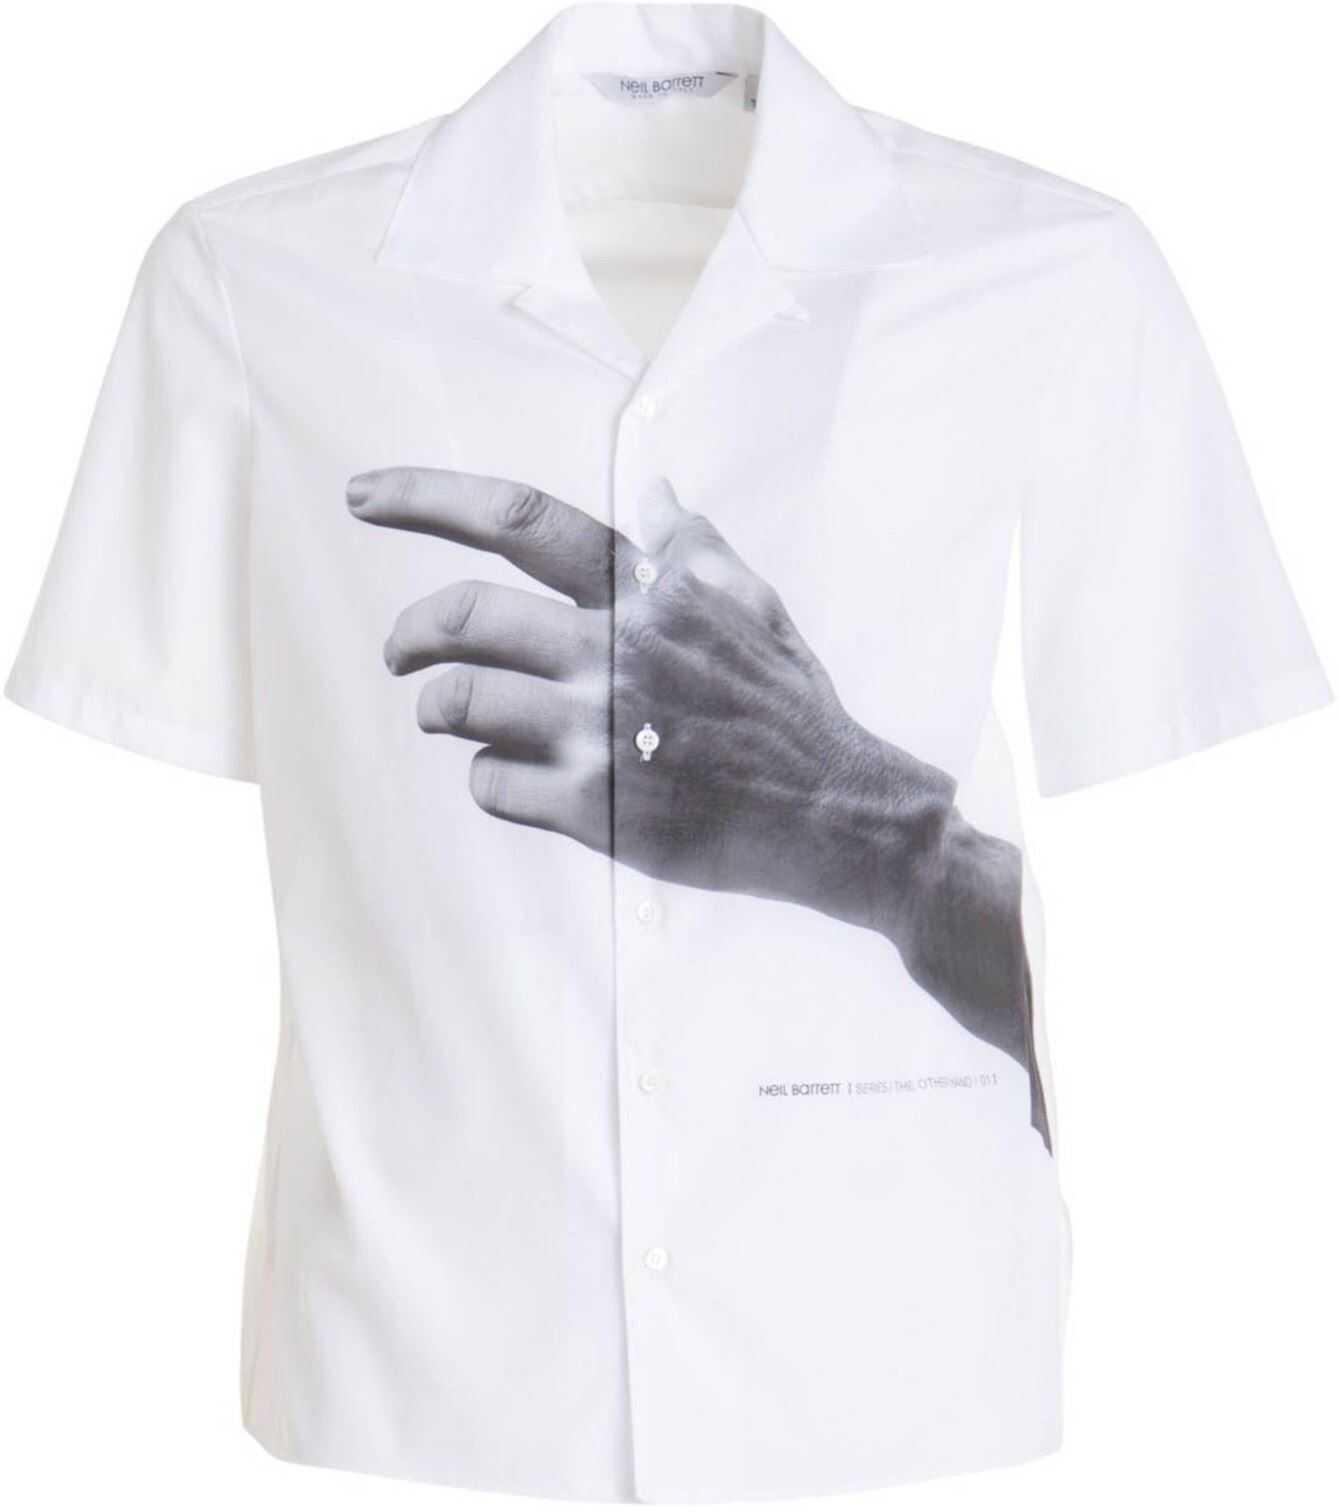 Neil Barrett The Other Hand Series Shirt White imagine